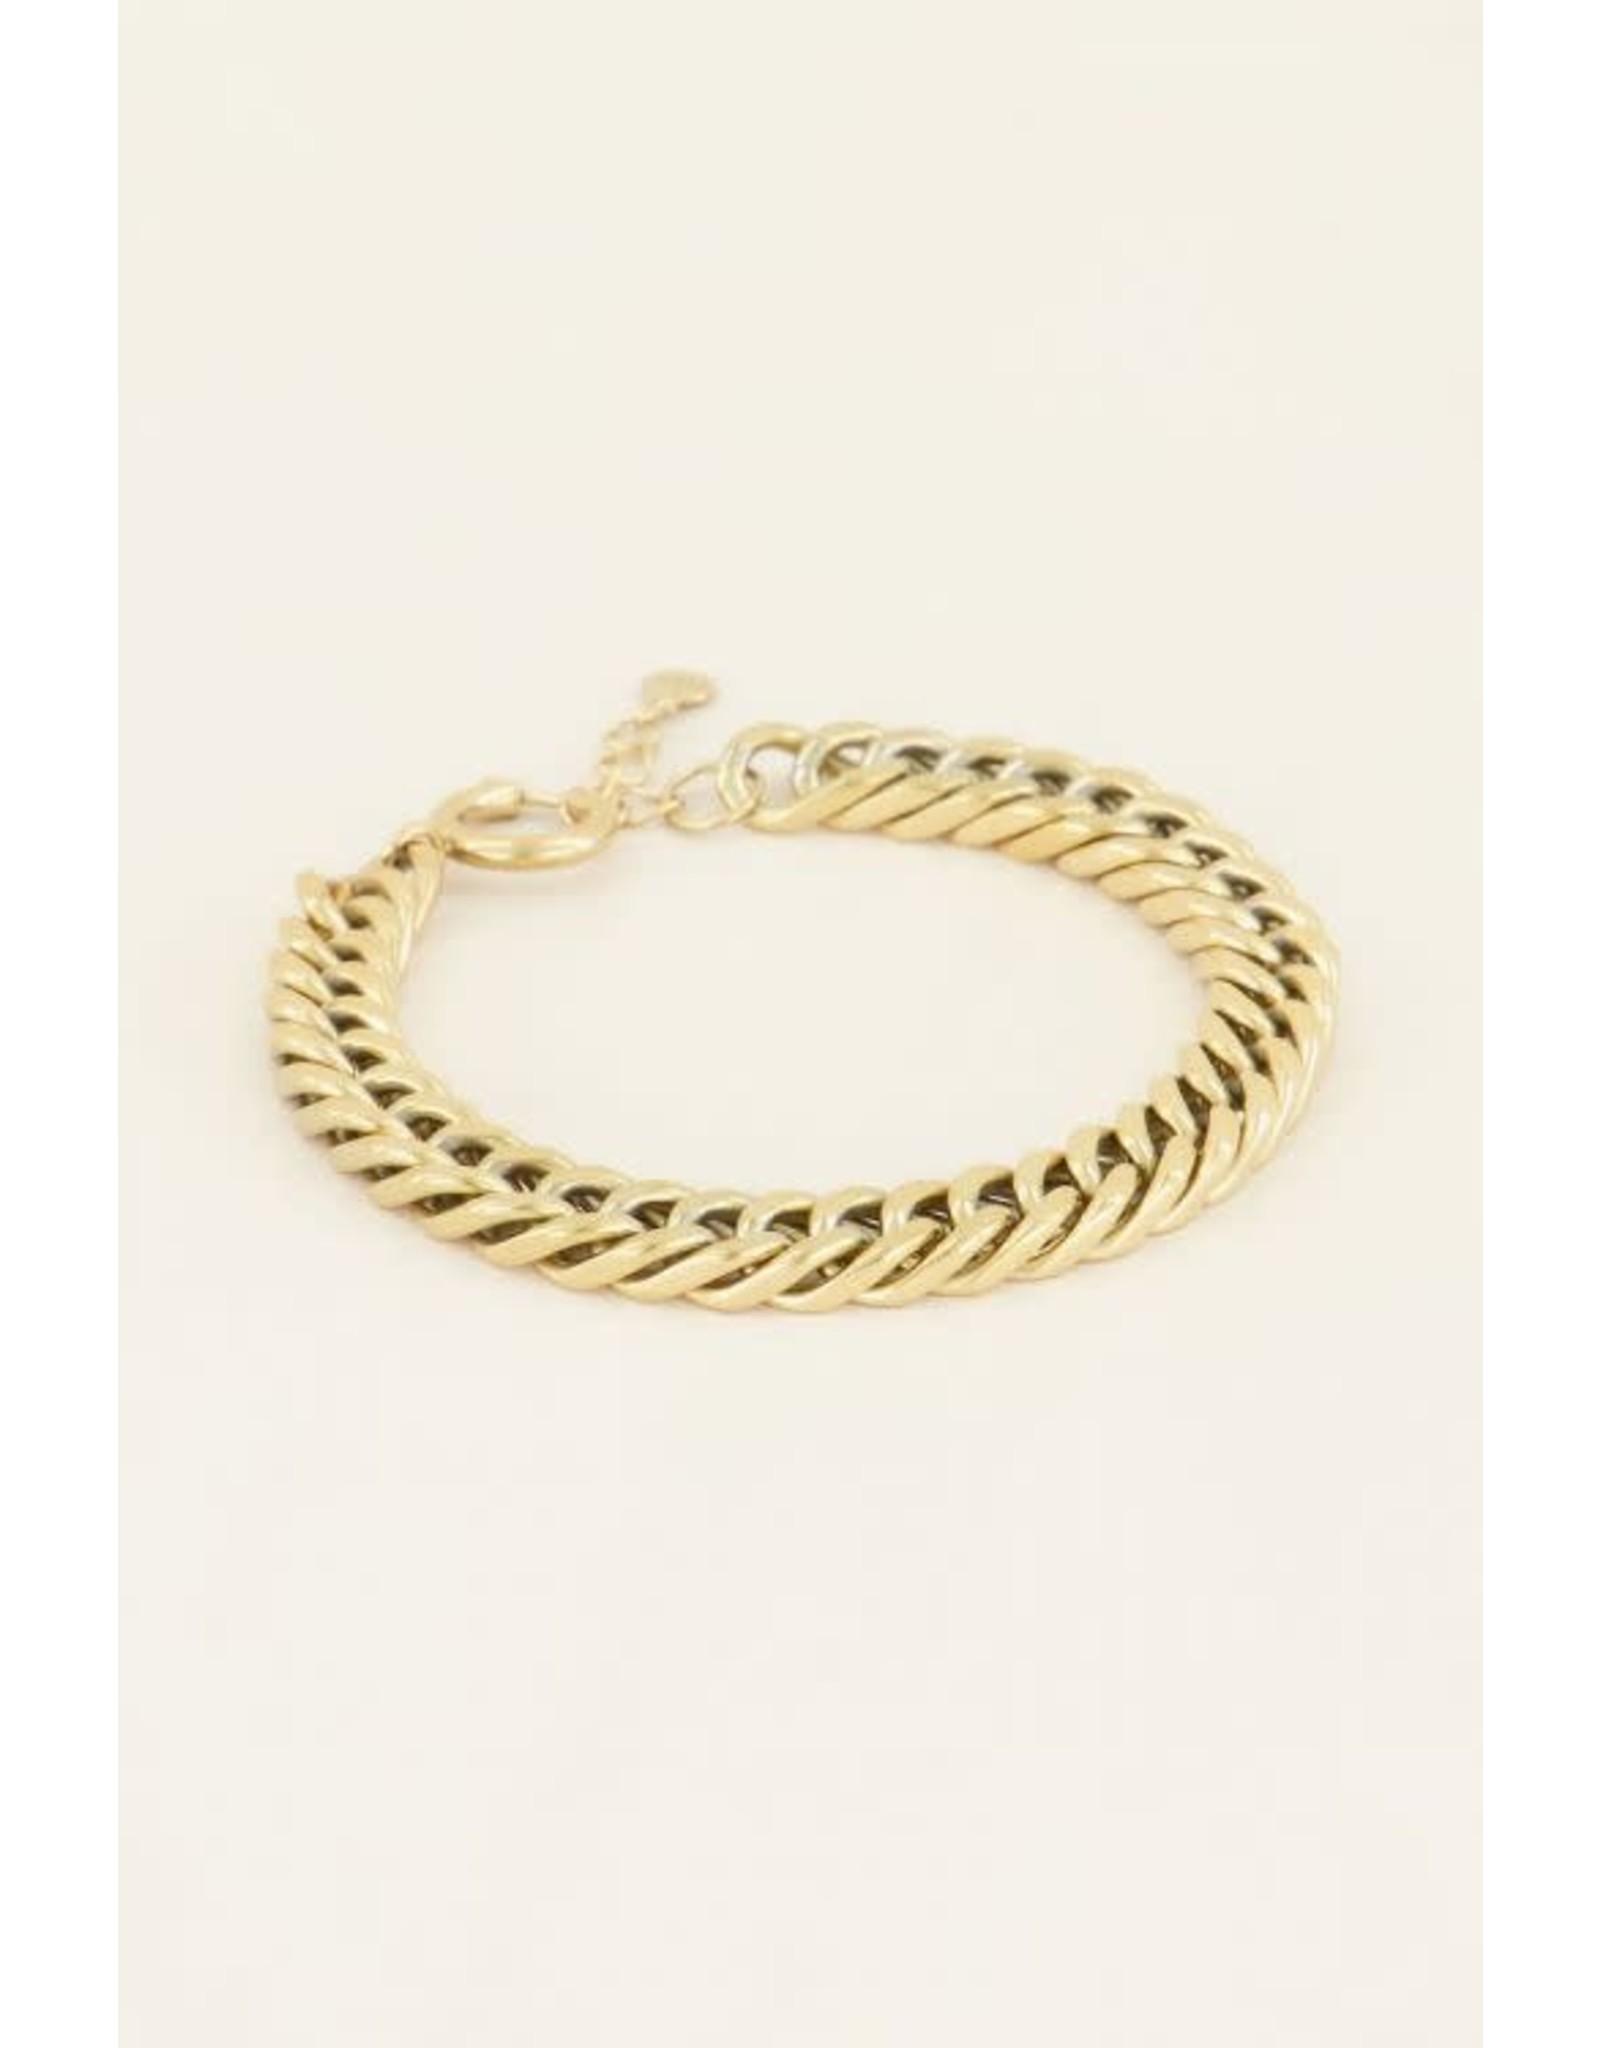 My Jewellery My Jewellery schakelarmband met ronde sluiting